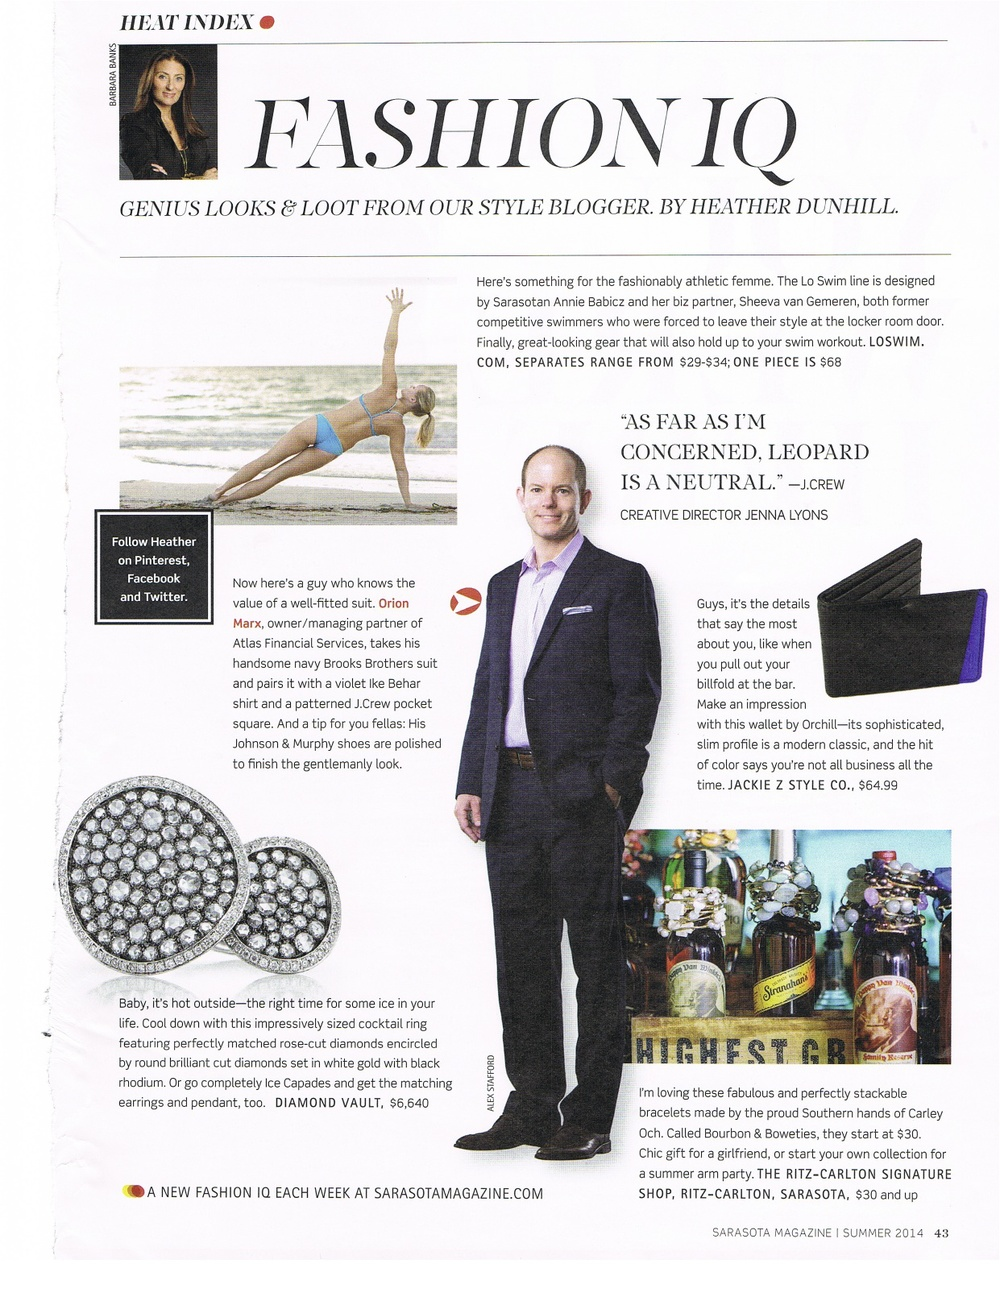 Sarasota Magazine - July 2014